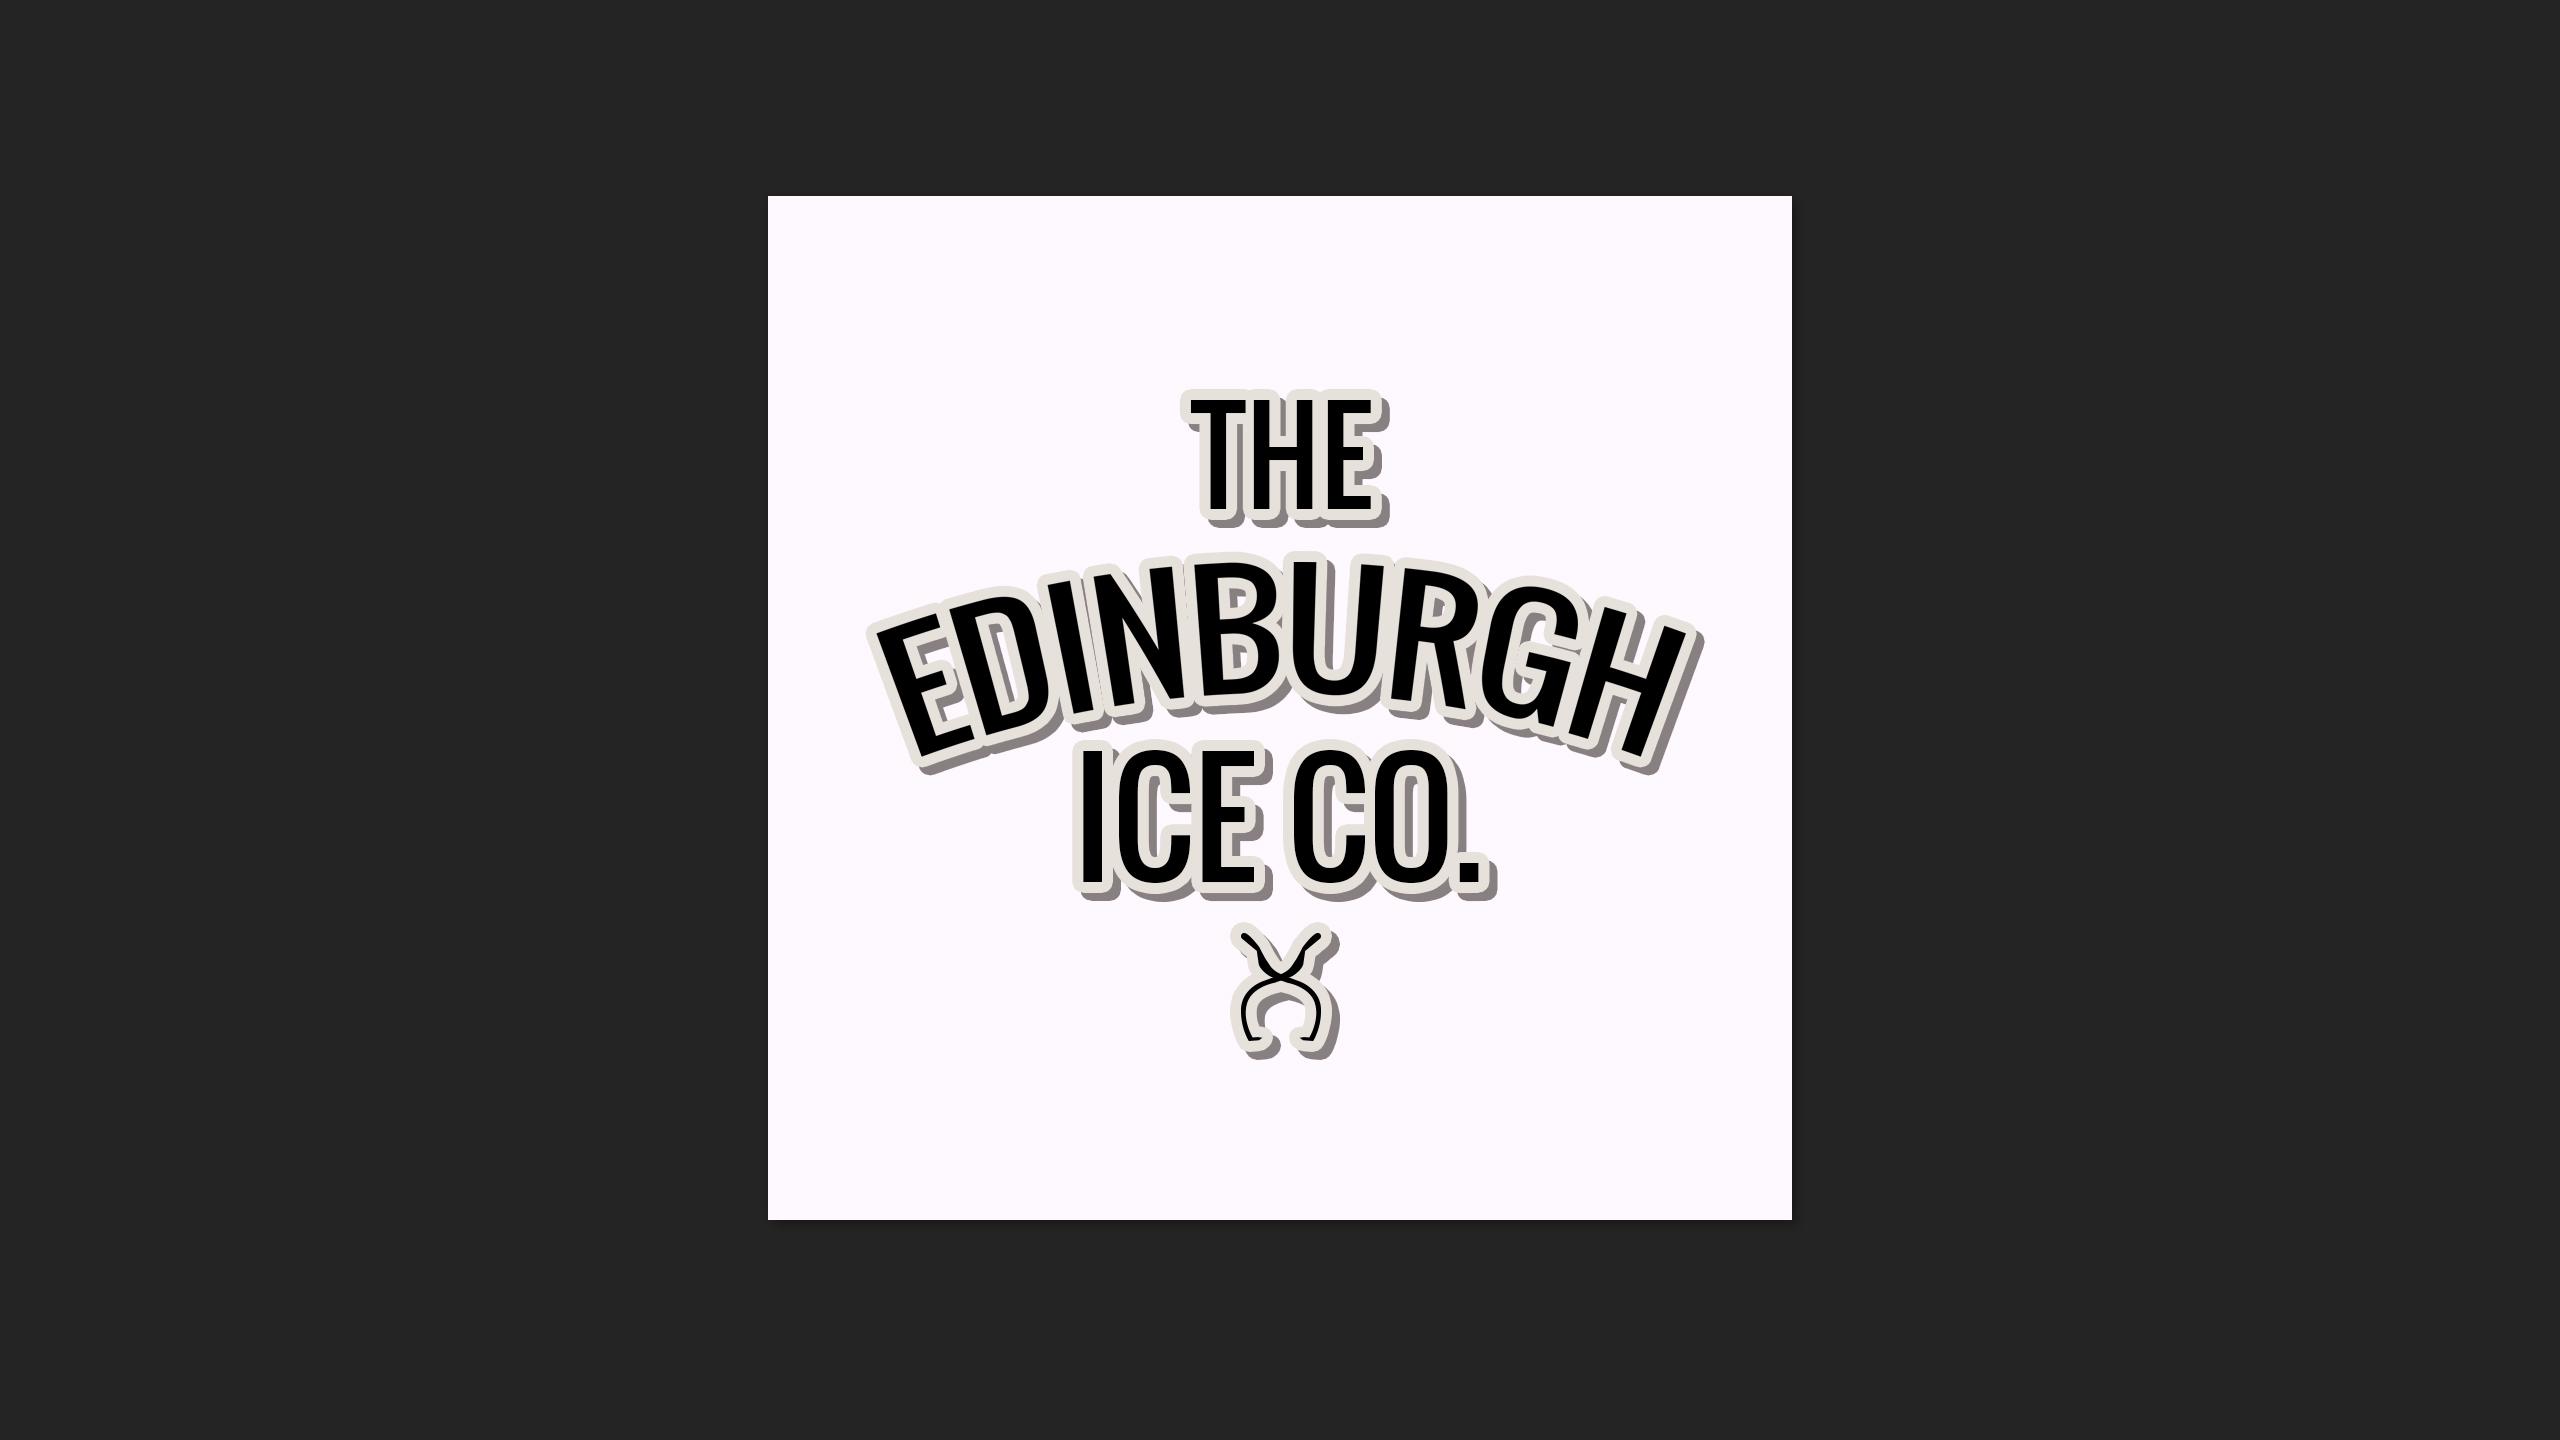 Branding design Created for the Edinburgh Ice Co.